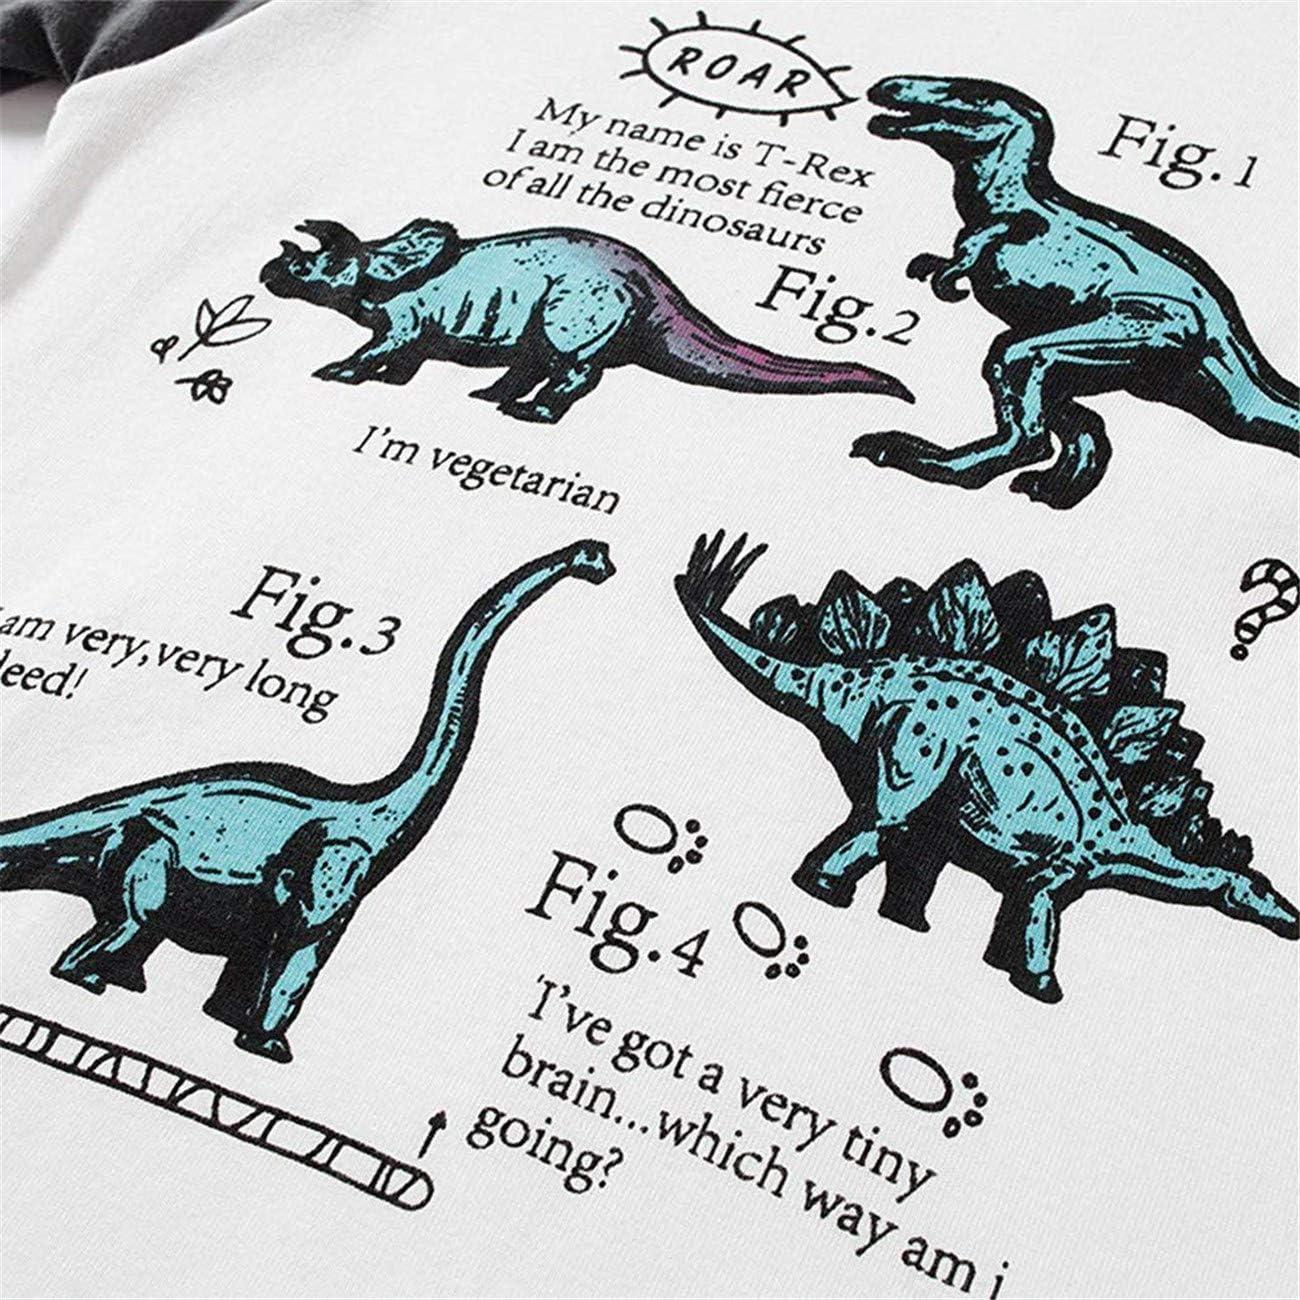 HCFKJ Ropa Bebe Ni/ñA Invierno Ni/ñO Manga Larga Camisetas BEB Conjuntos Moda Beb/é Ni/ñOs Ni/ñAs De Manga Larga Dinosaurio Tops Pantalones Pijamas Traje De Dormir